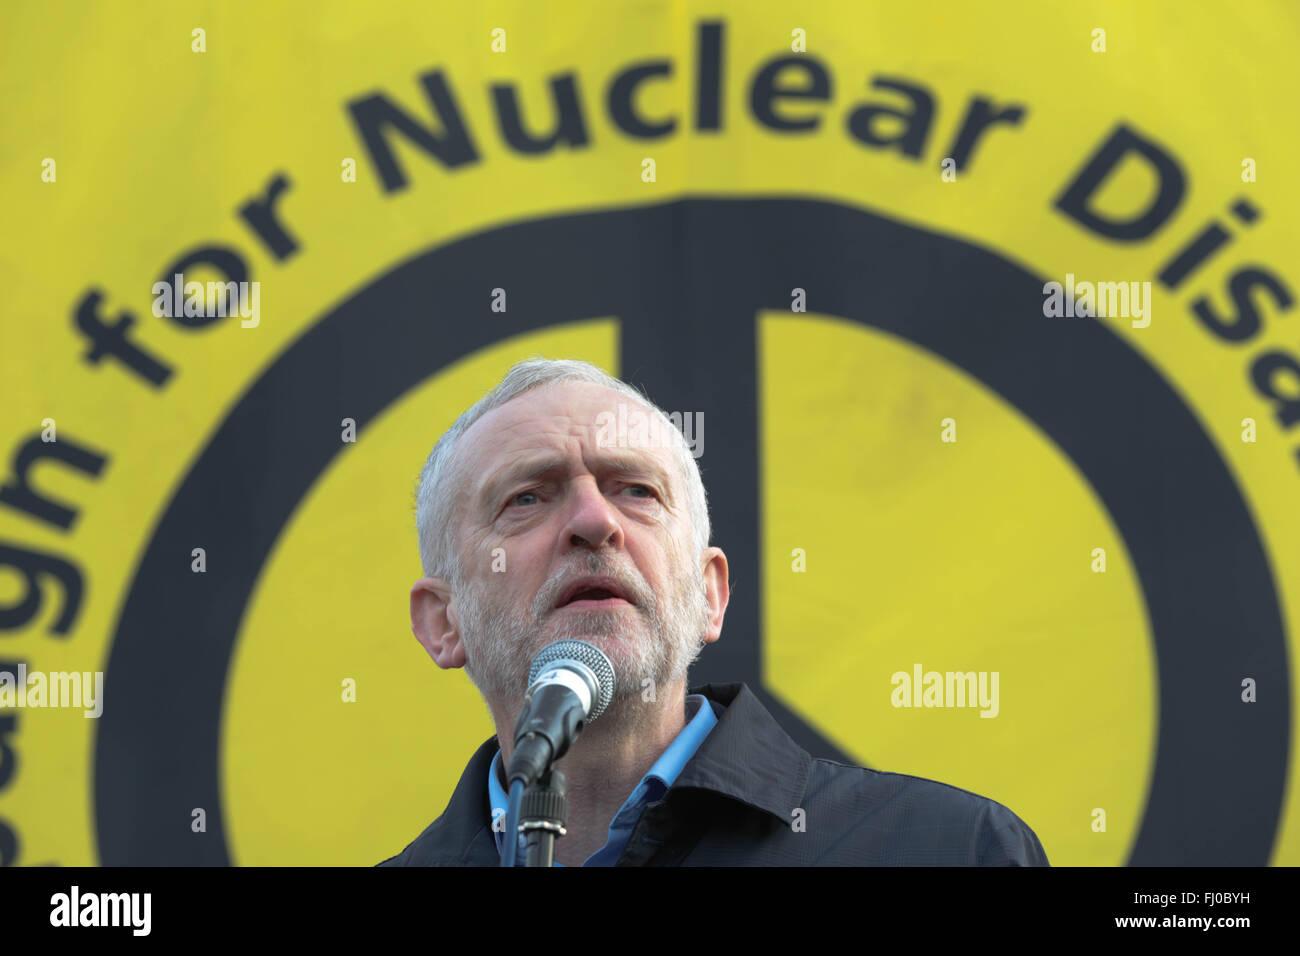 Londres, Royaume-Uni, le 27 février, 2016. Adresse Jeremy Corbyn plus grande manifestation anti-Trident Credit: Thabo Jaiyesimi/Alamy Live News Banque D'Images